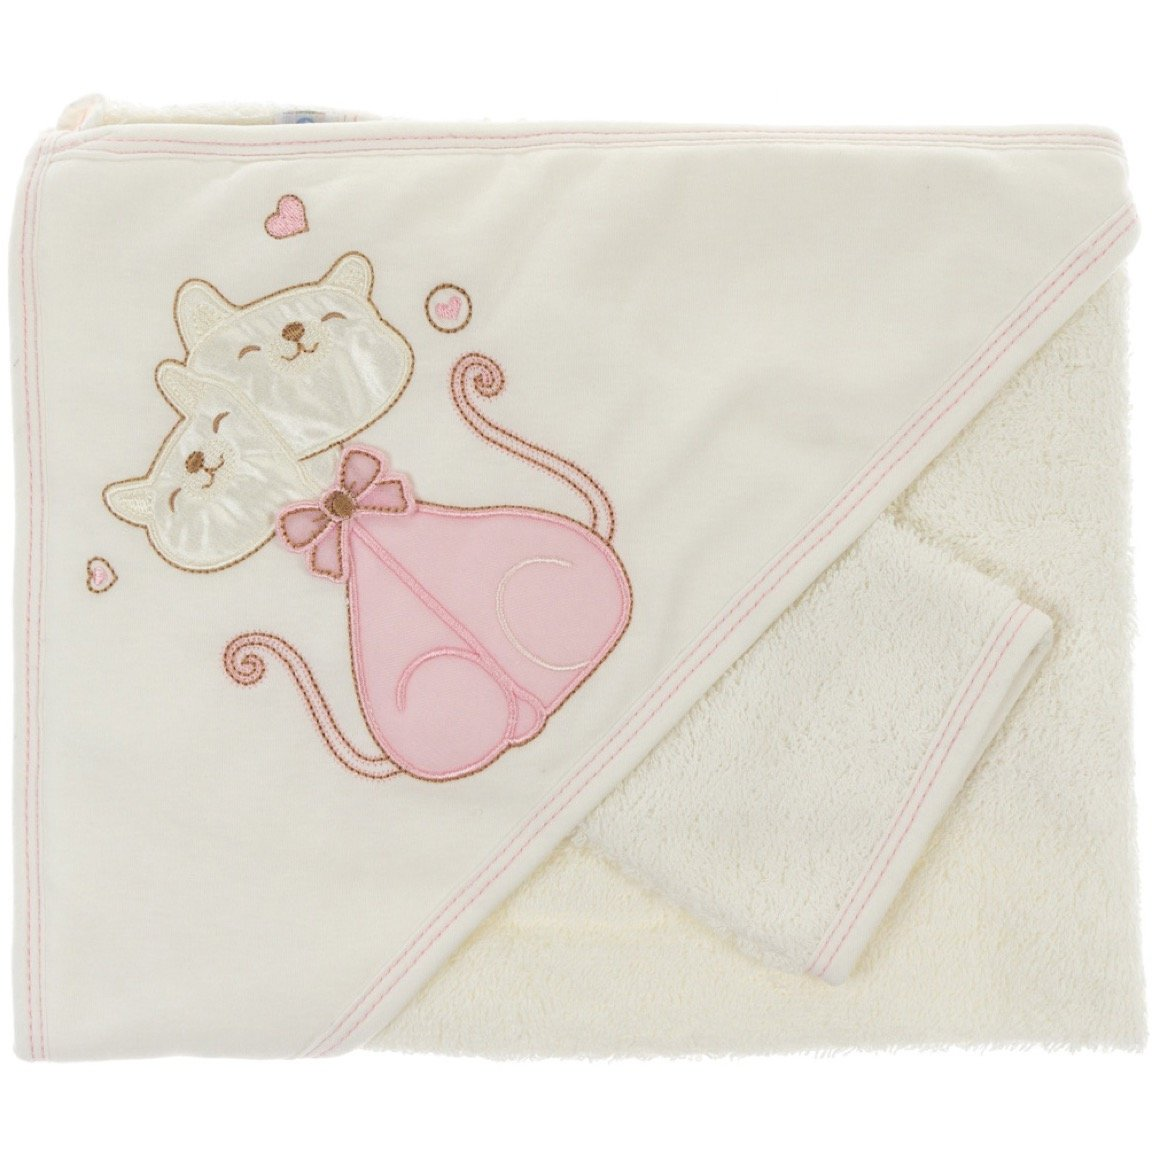 Eky Baby παιδικό μπουρνούζι-κάπα & γαντάκι μπάνιου «The Kitten Love»